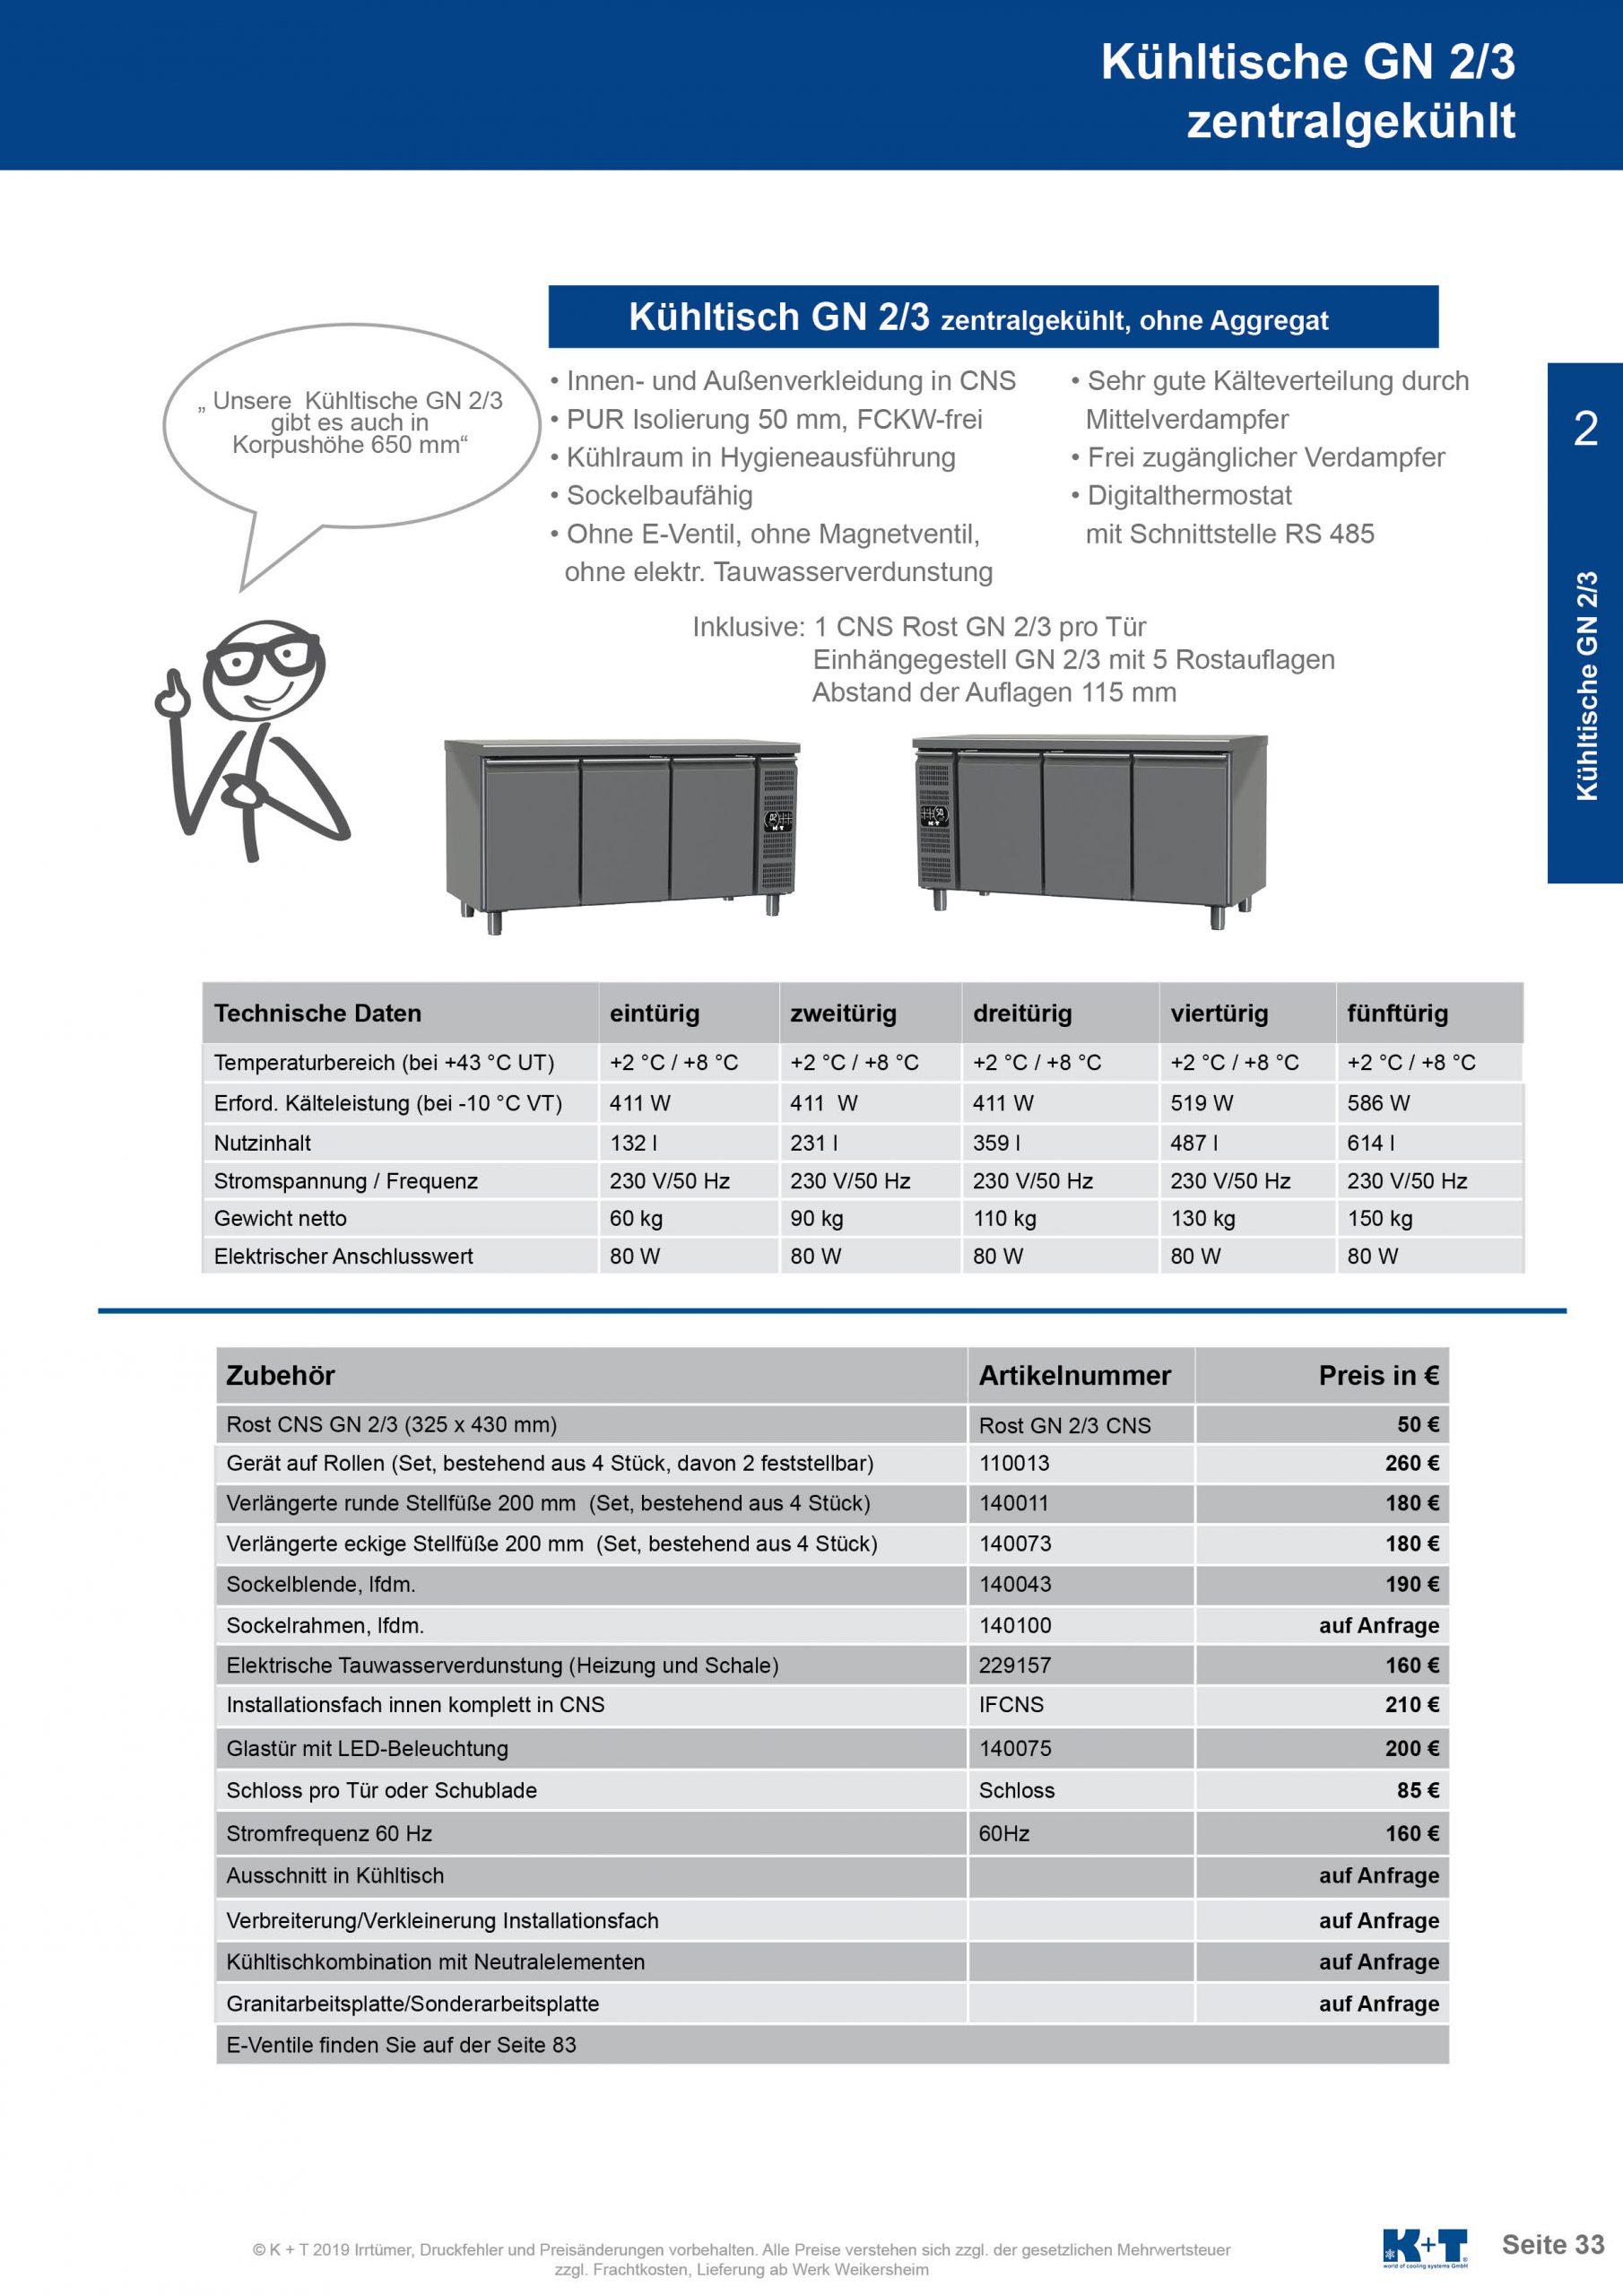 Kühltisch GN 2_3 Korpus 700 zentralgekühlt 2